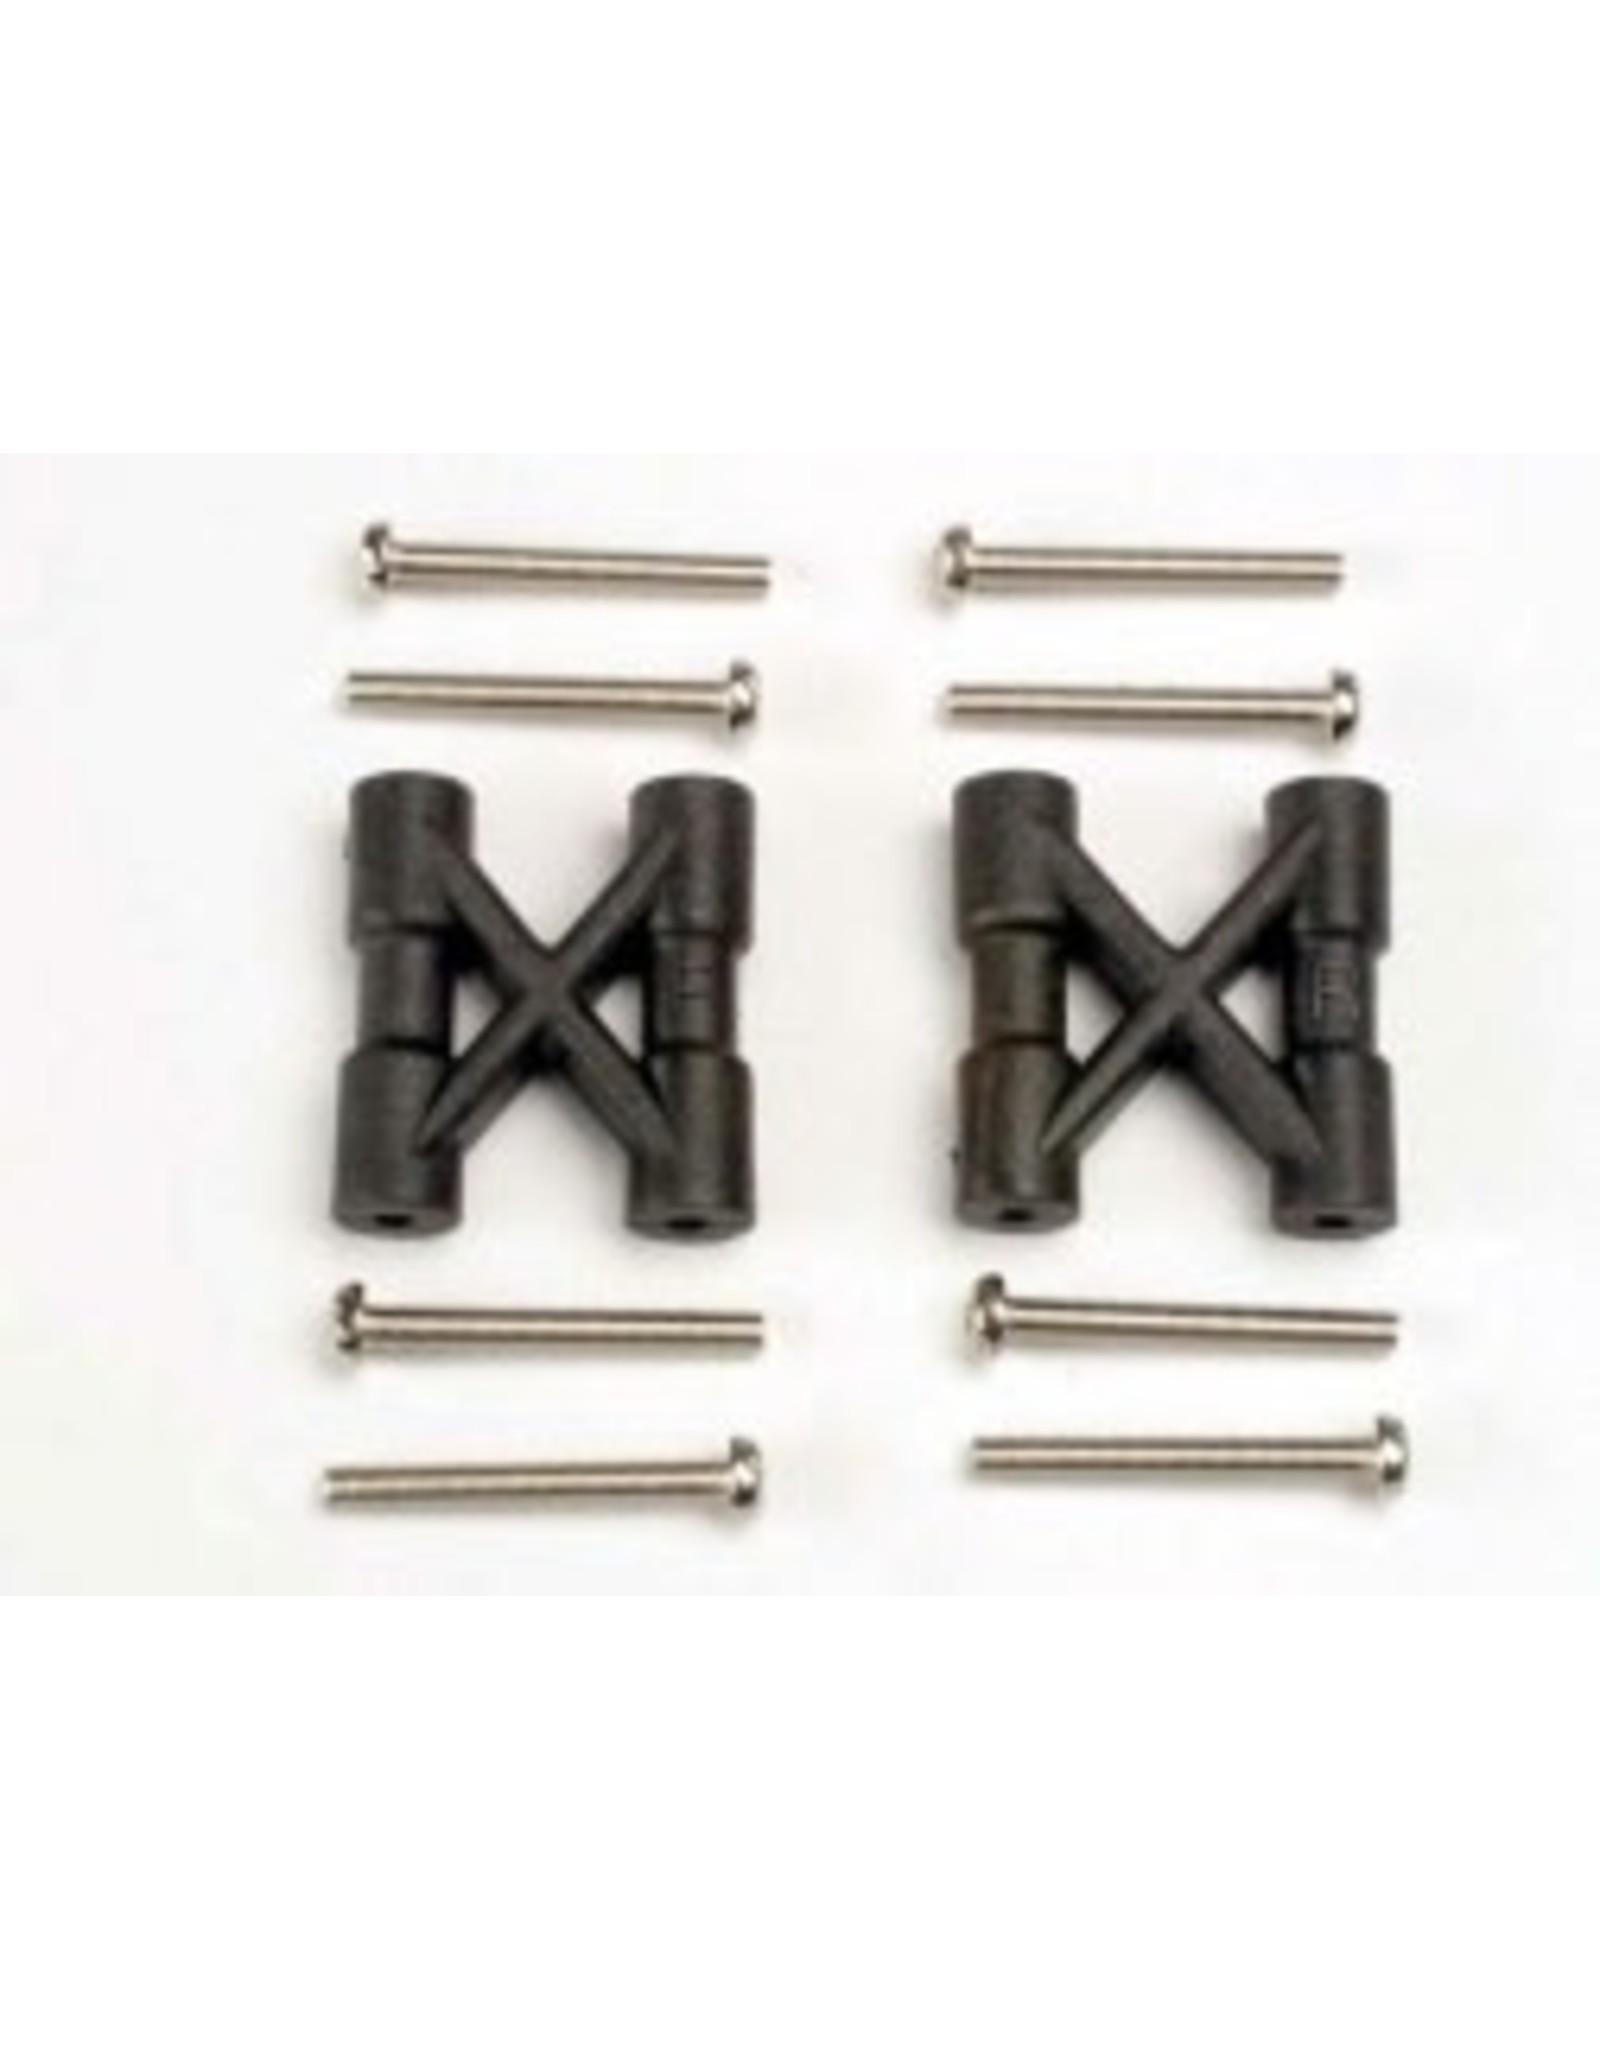 Traxxas Bulkhead cross braces (2)/ 3x25mm CS screws (8)  (TRA3930)